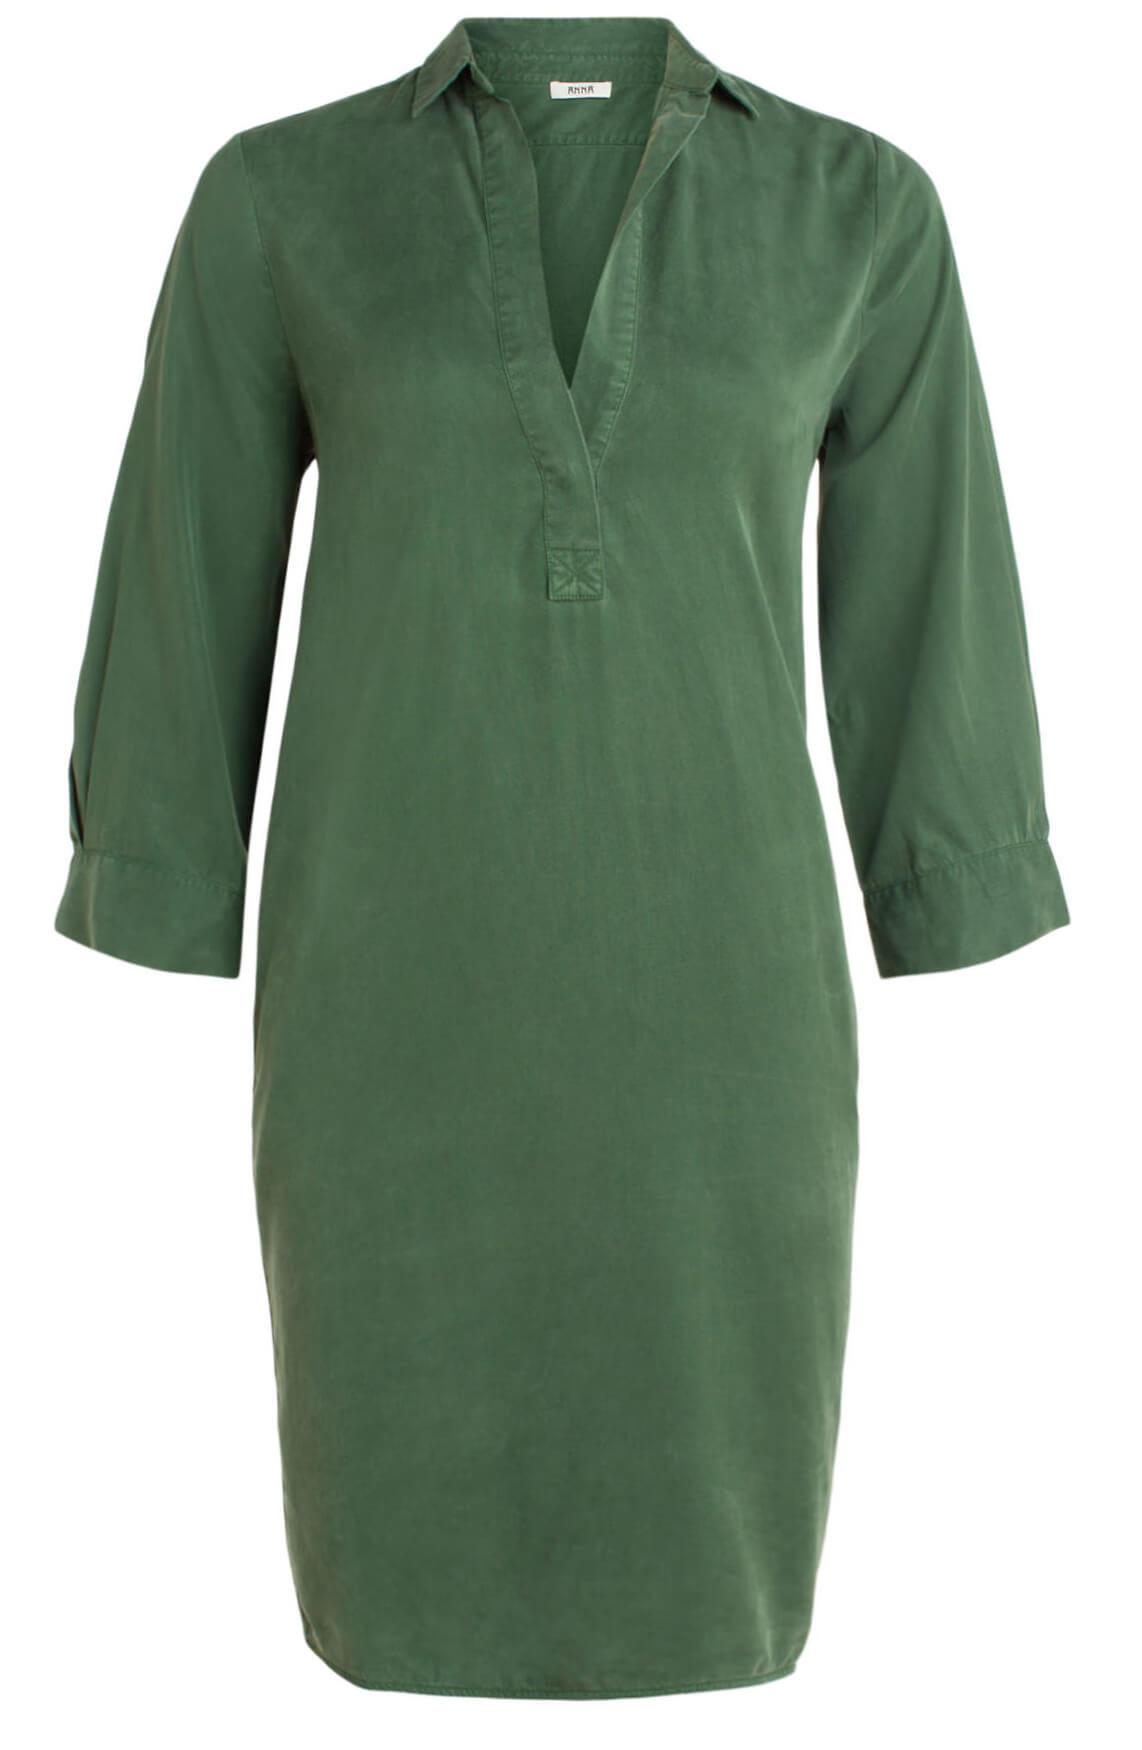 Anna Dames Tencel garment dye jurk groen